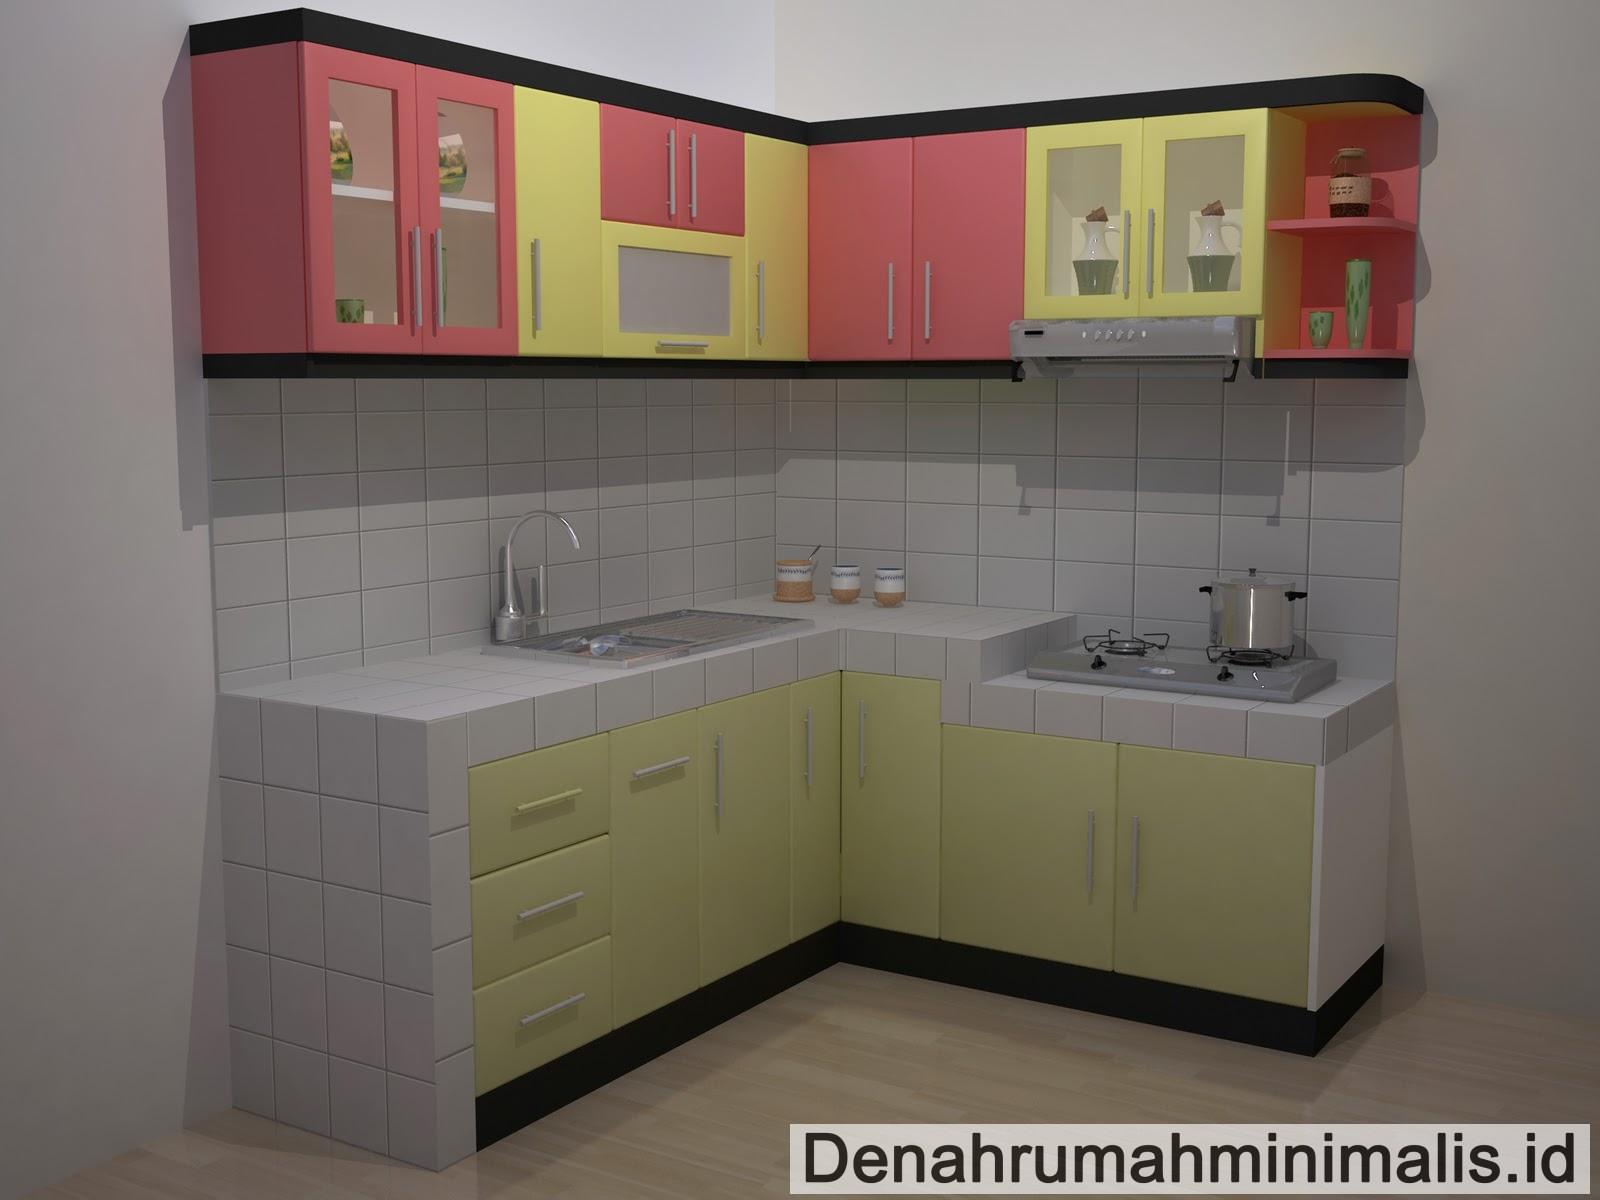 Wallpaper Dapur Minimalis Desain Meja Dapur Minimalis 740185